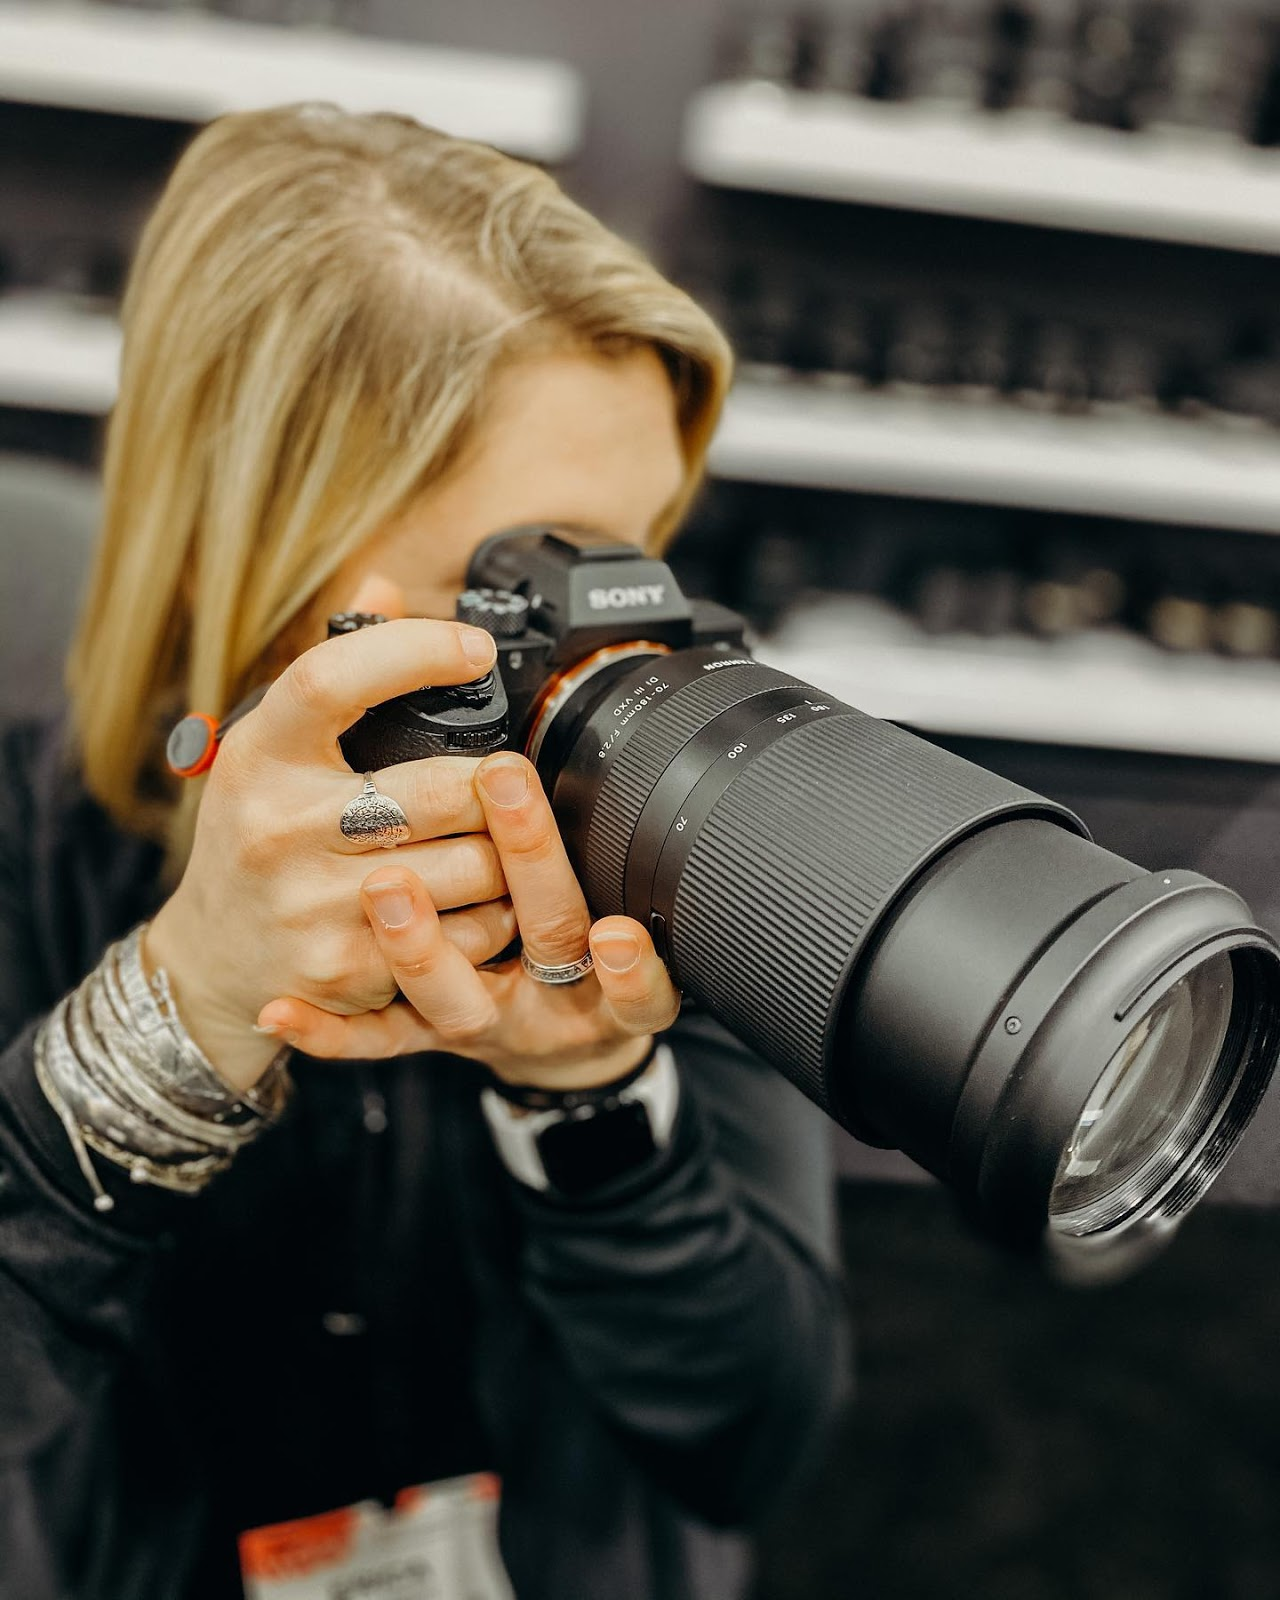 Фотограф снимает с помощью объектива Tamron 70-180mm f/2.8